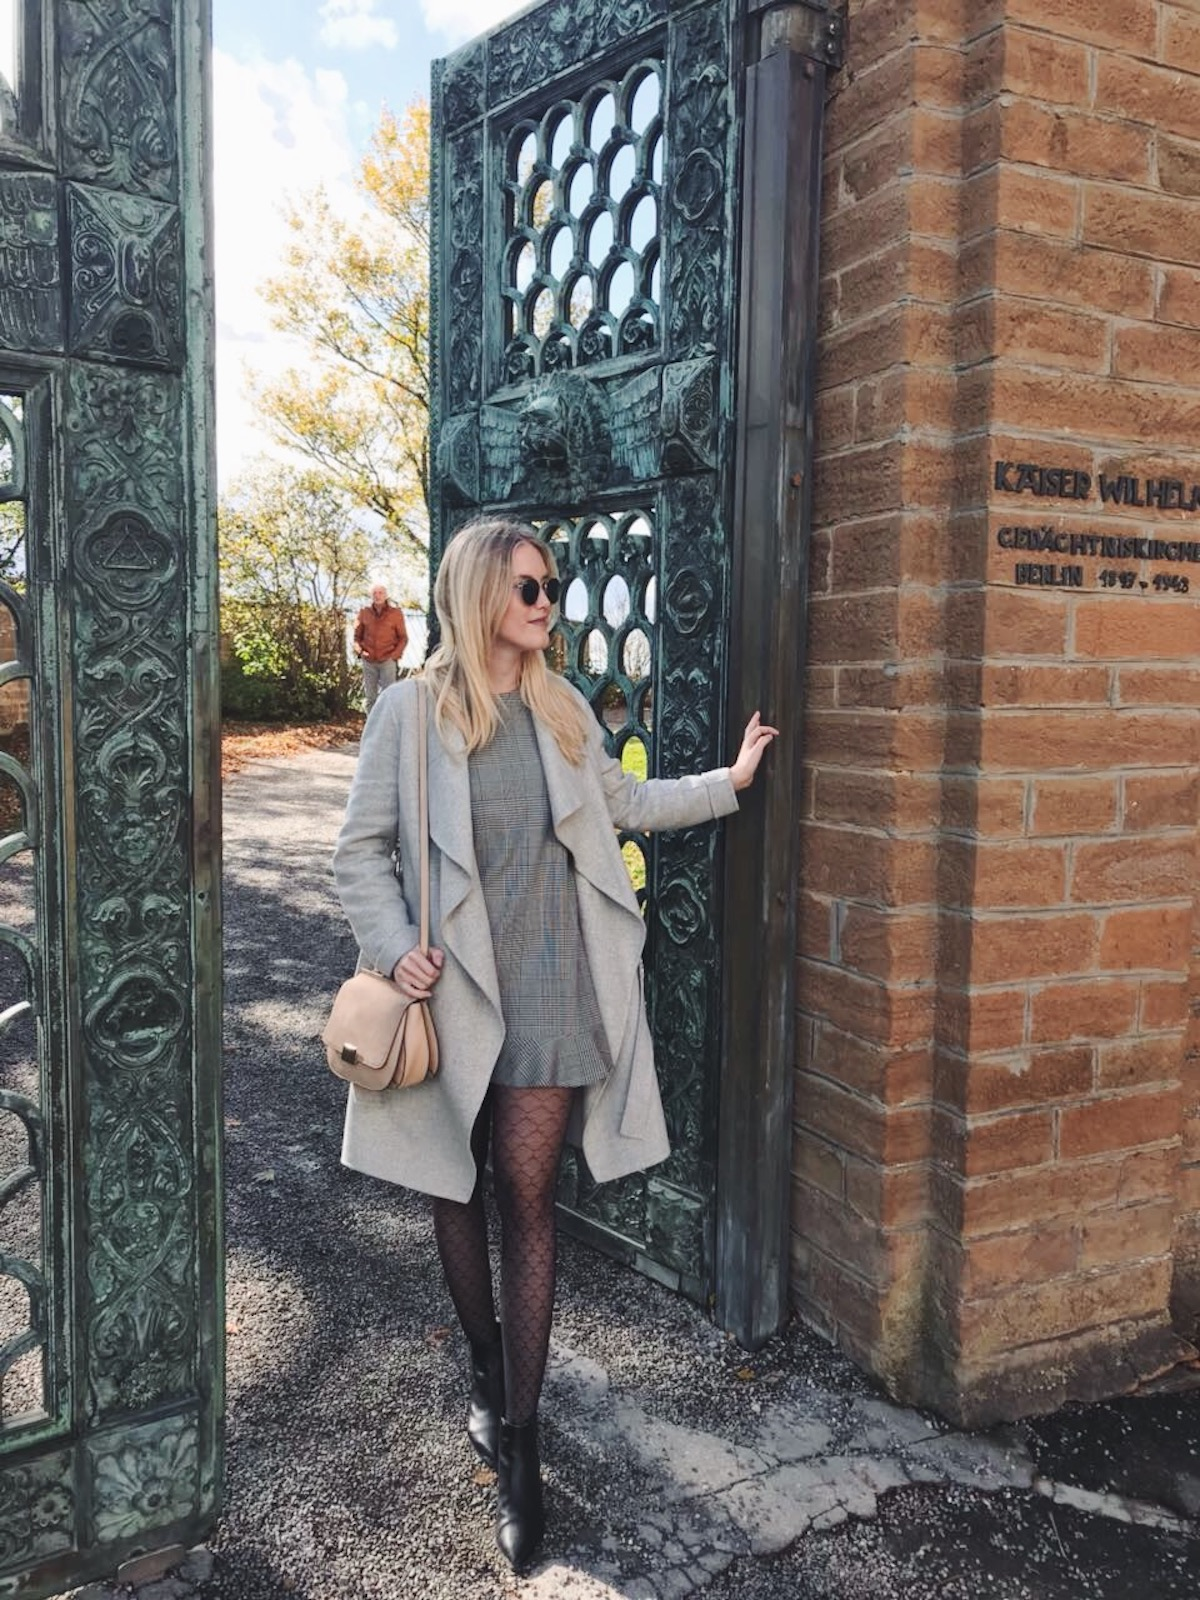 Fashion-Outfit-Stuttgart Blog-Burg Hohenzollern-Strumpfhosen-gemustert-Tights-Gambettes Box-18A